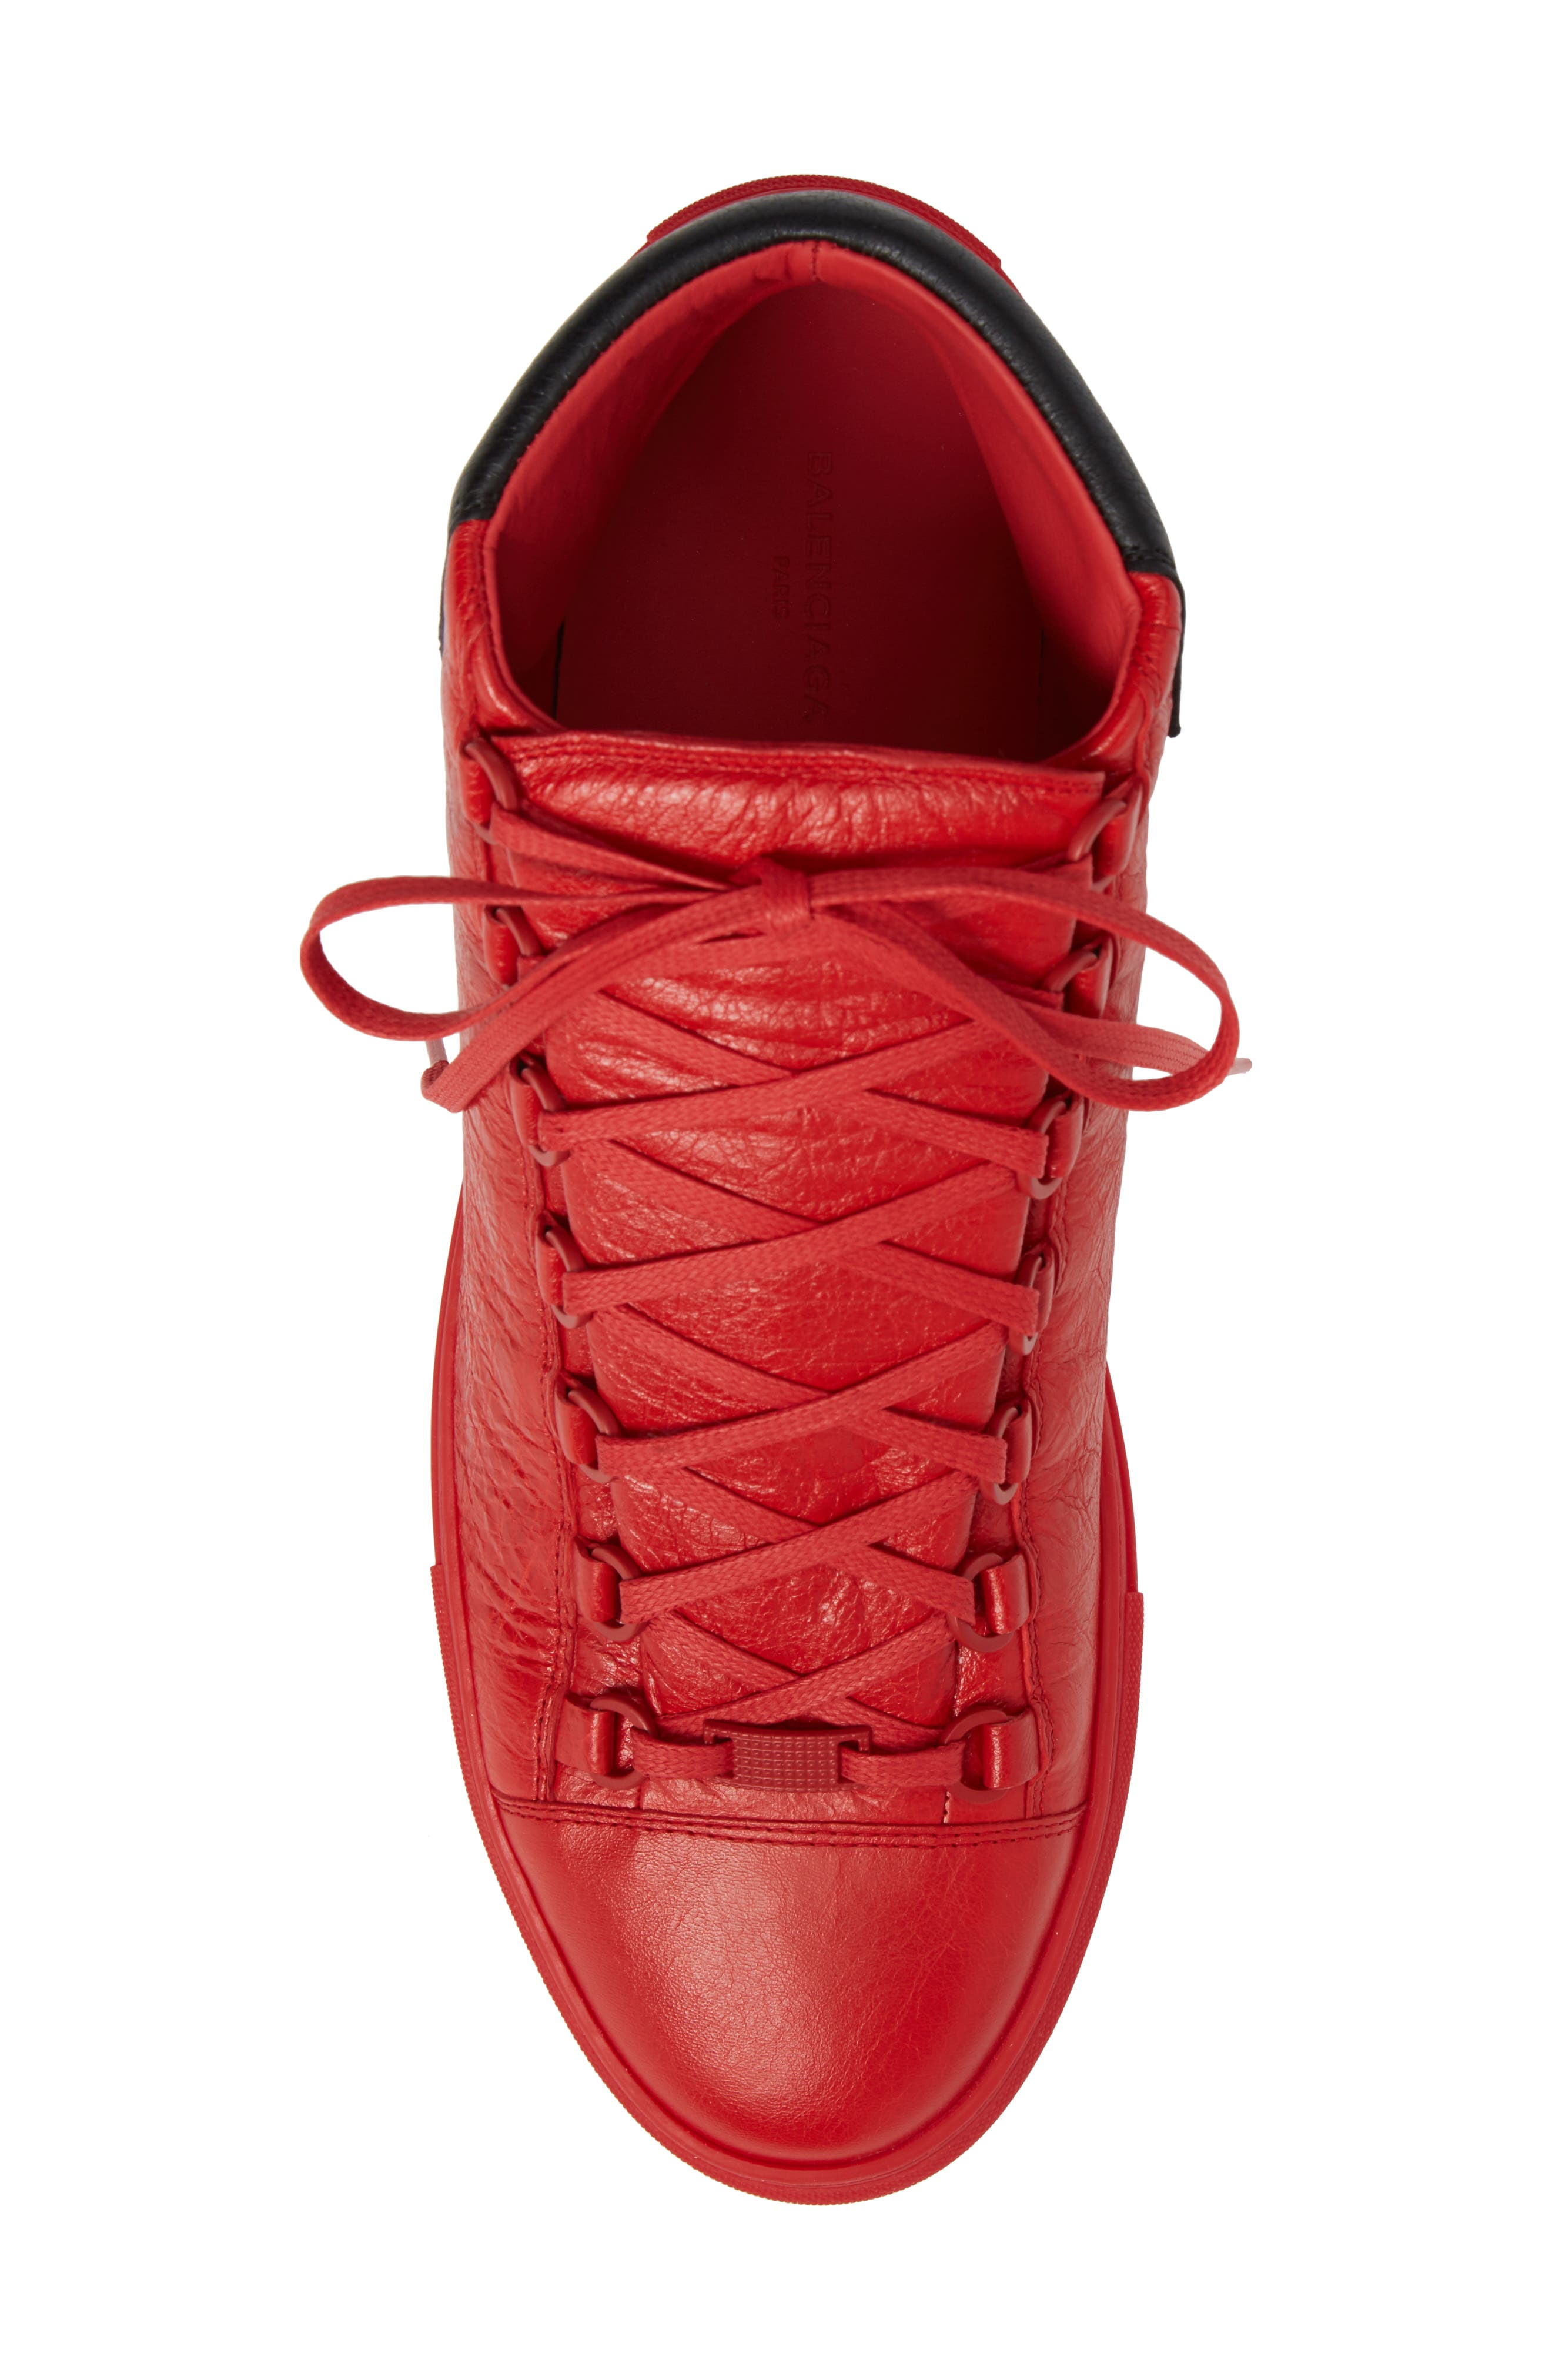 Arena High Sneaker,                             Alternate thumbnail 5, color,                             Rouge Paprika/ Noir Leather